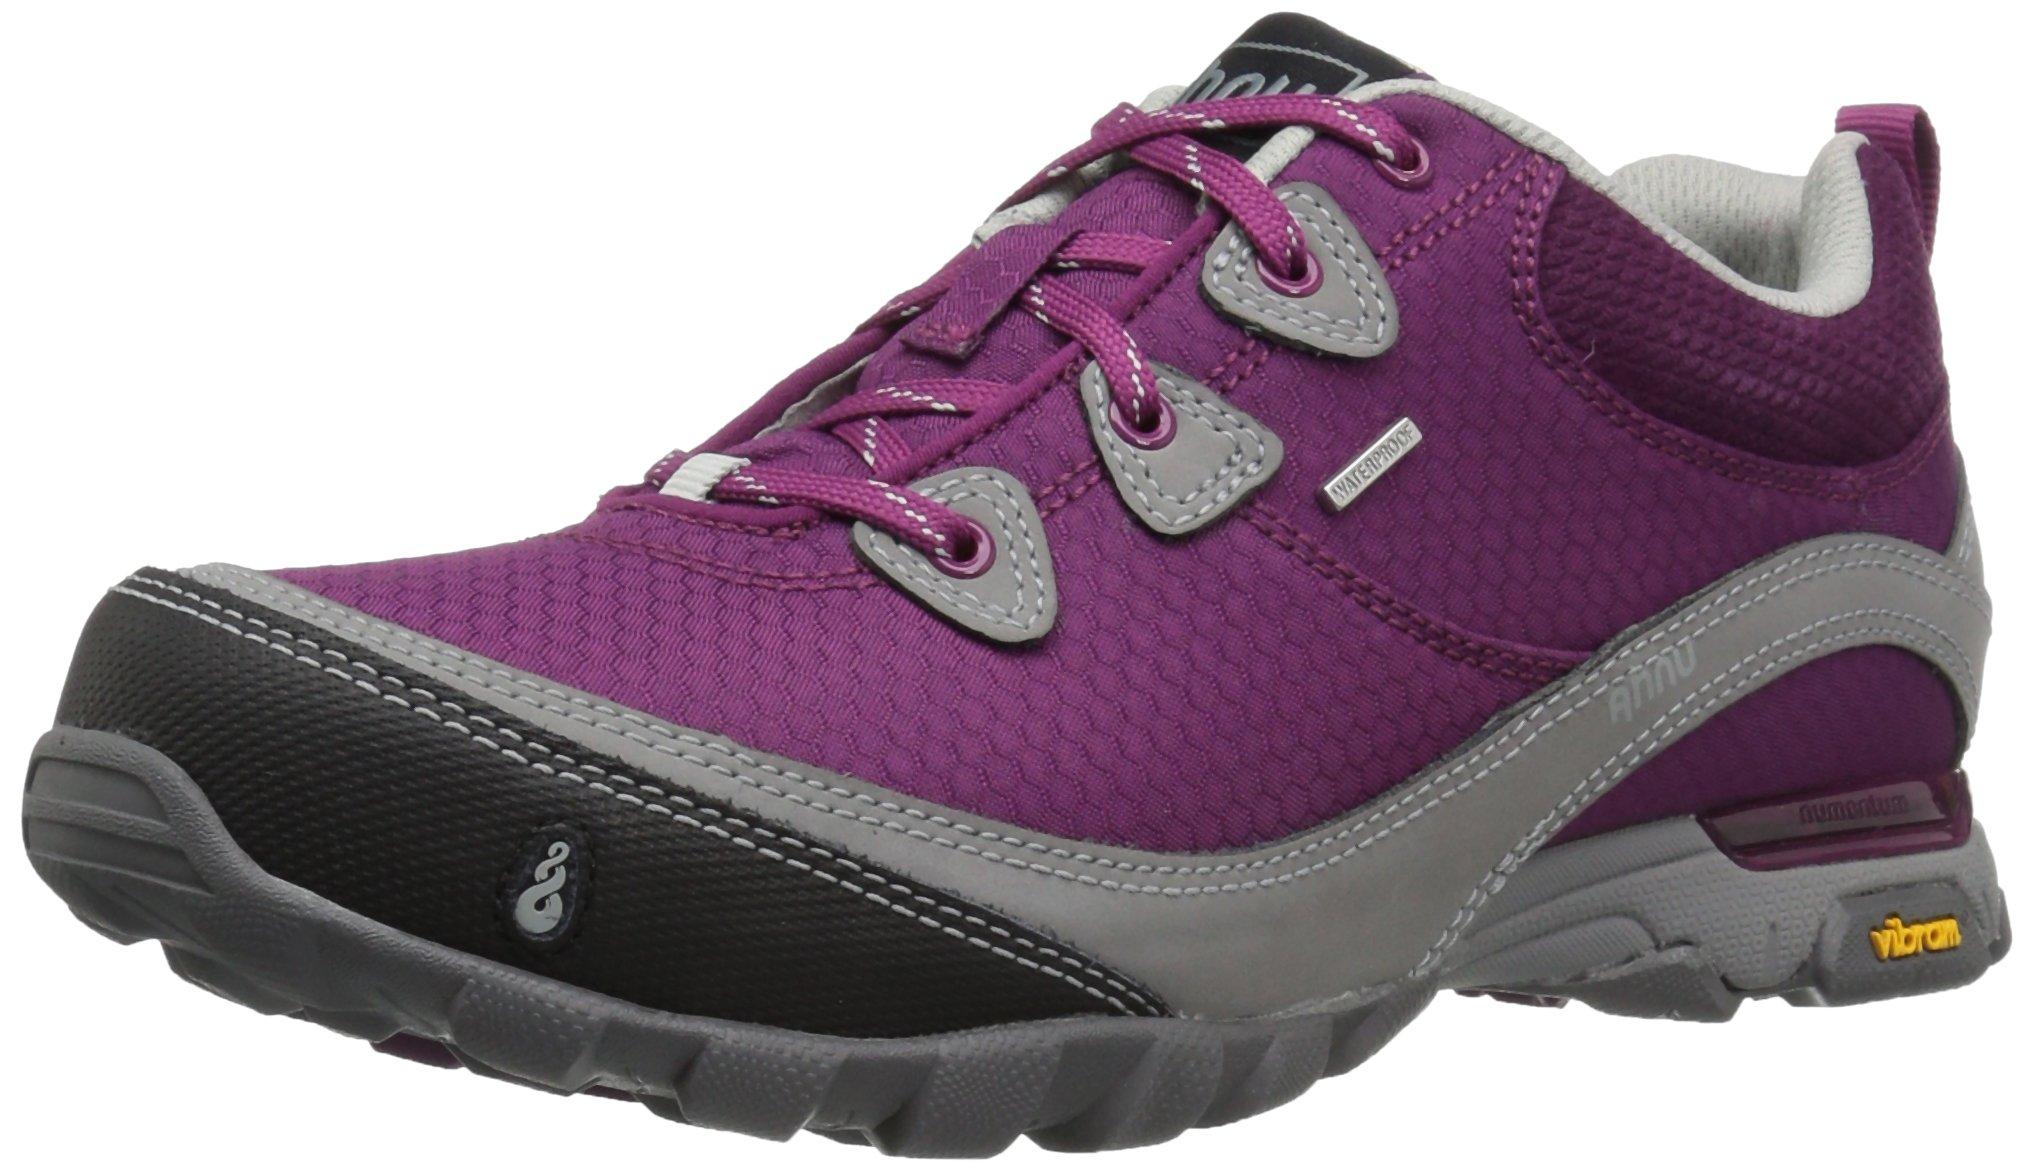 Ahnu Women's W Sugarpine Waterproof Hiking Shoe, Royal Magenta, 7.5 M US